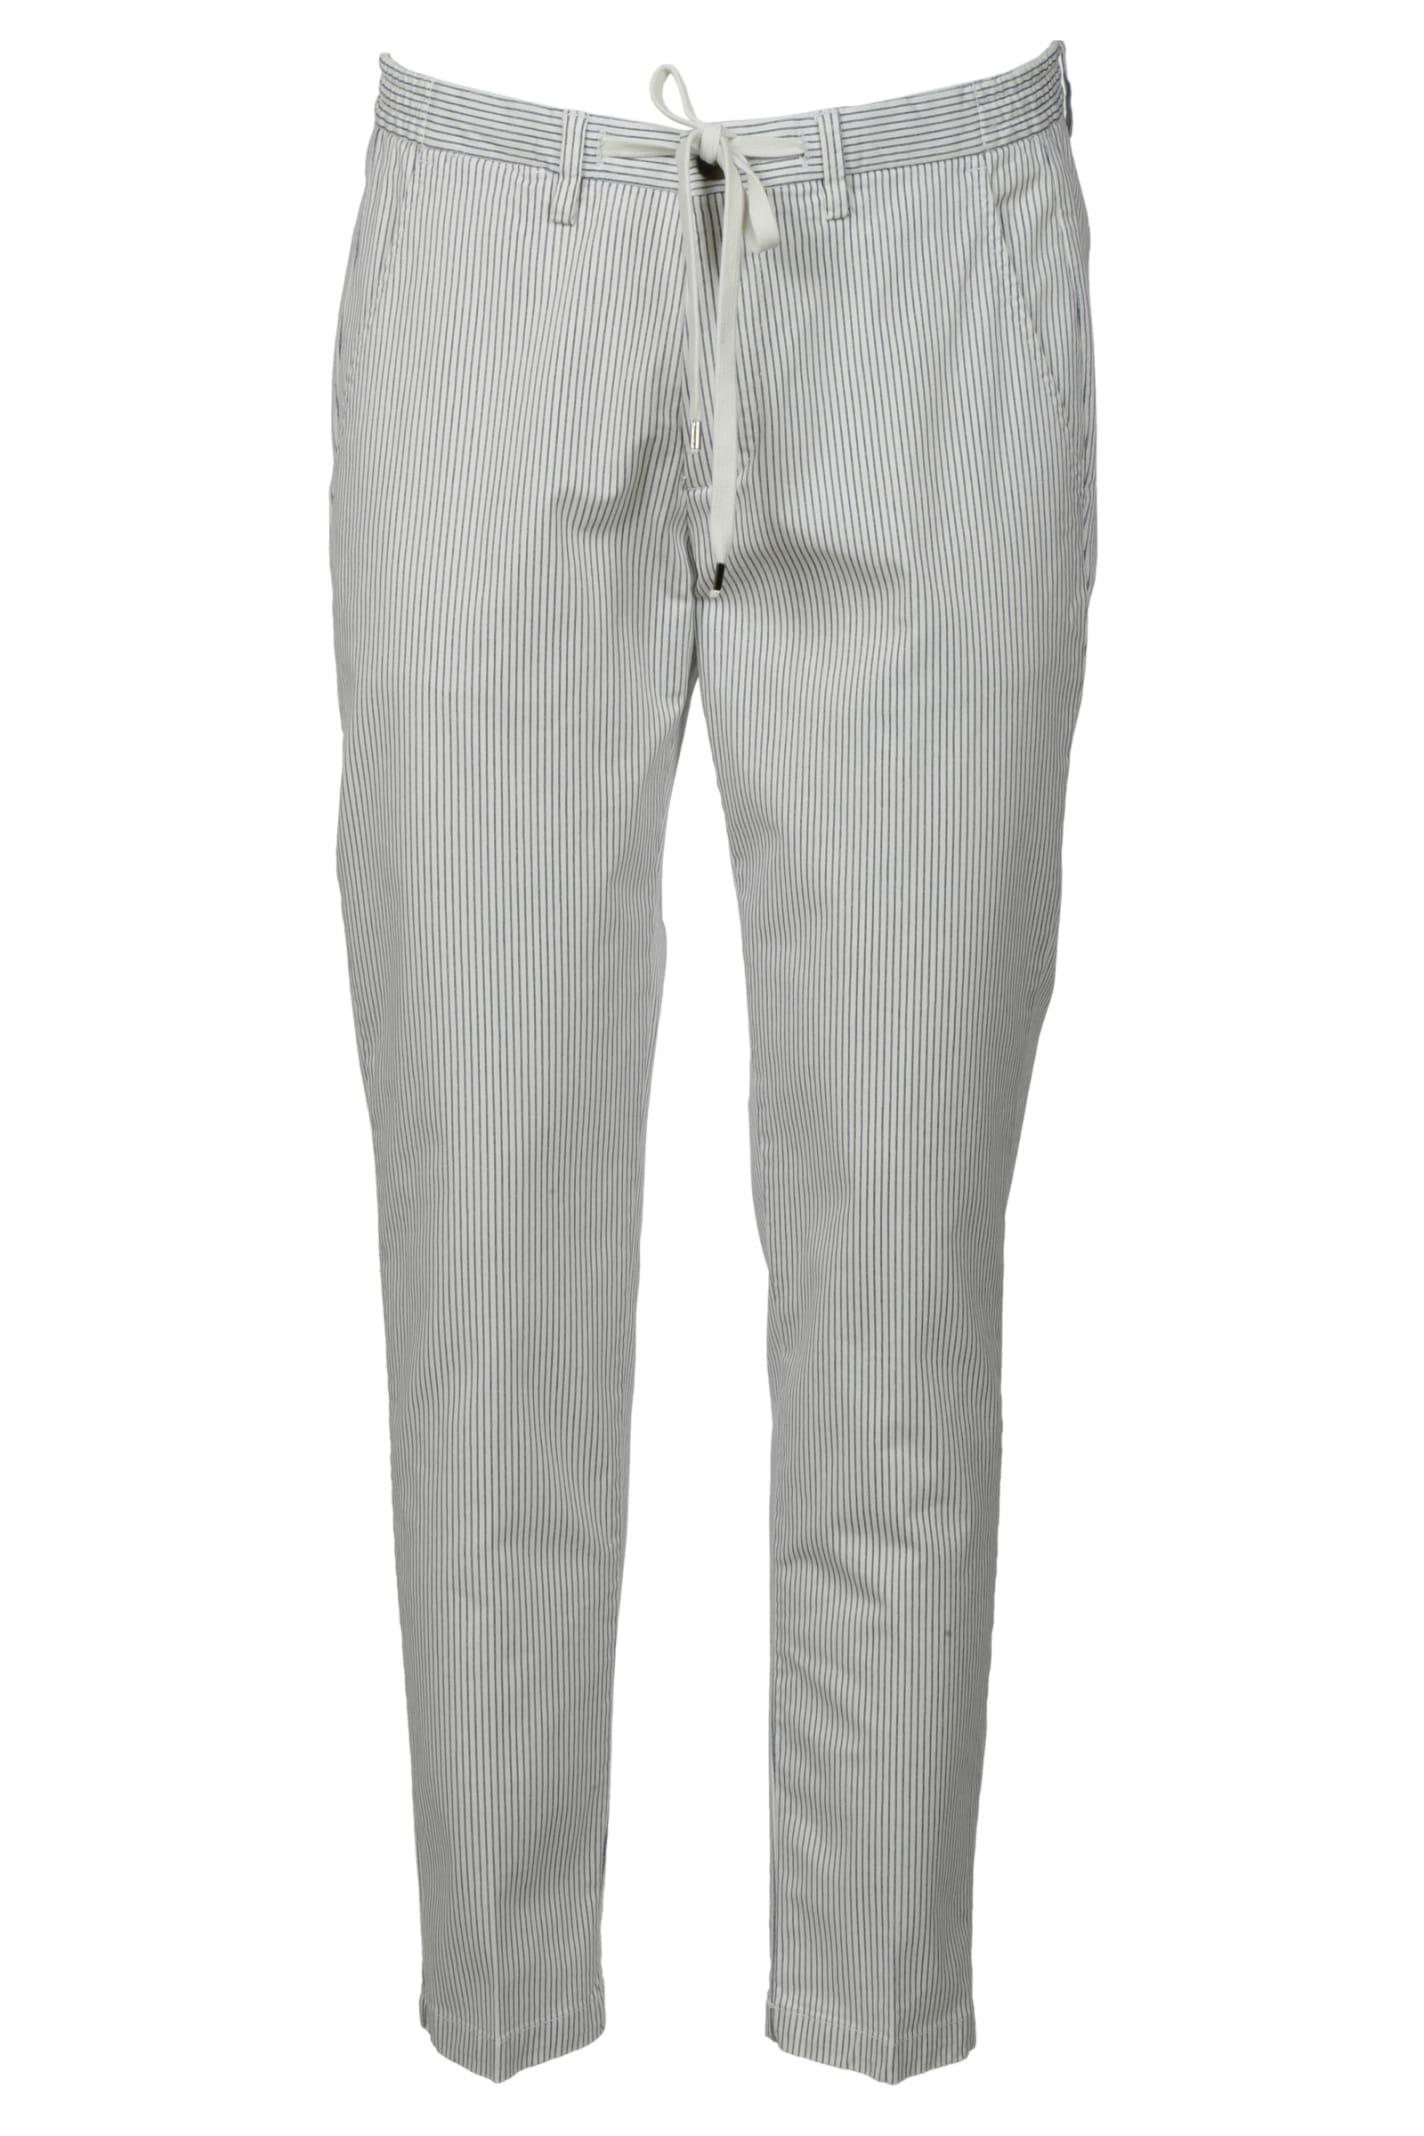 Briglia 1949 Tie-waist Stripe Cropped Trousers